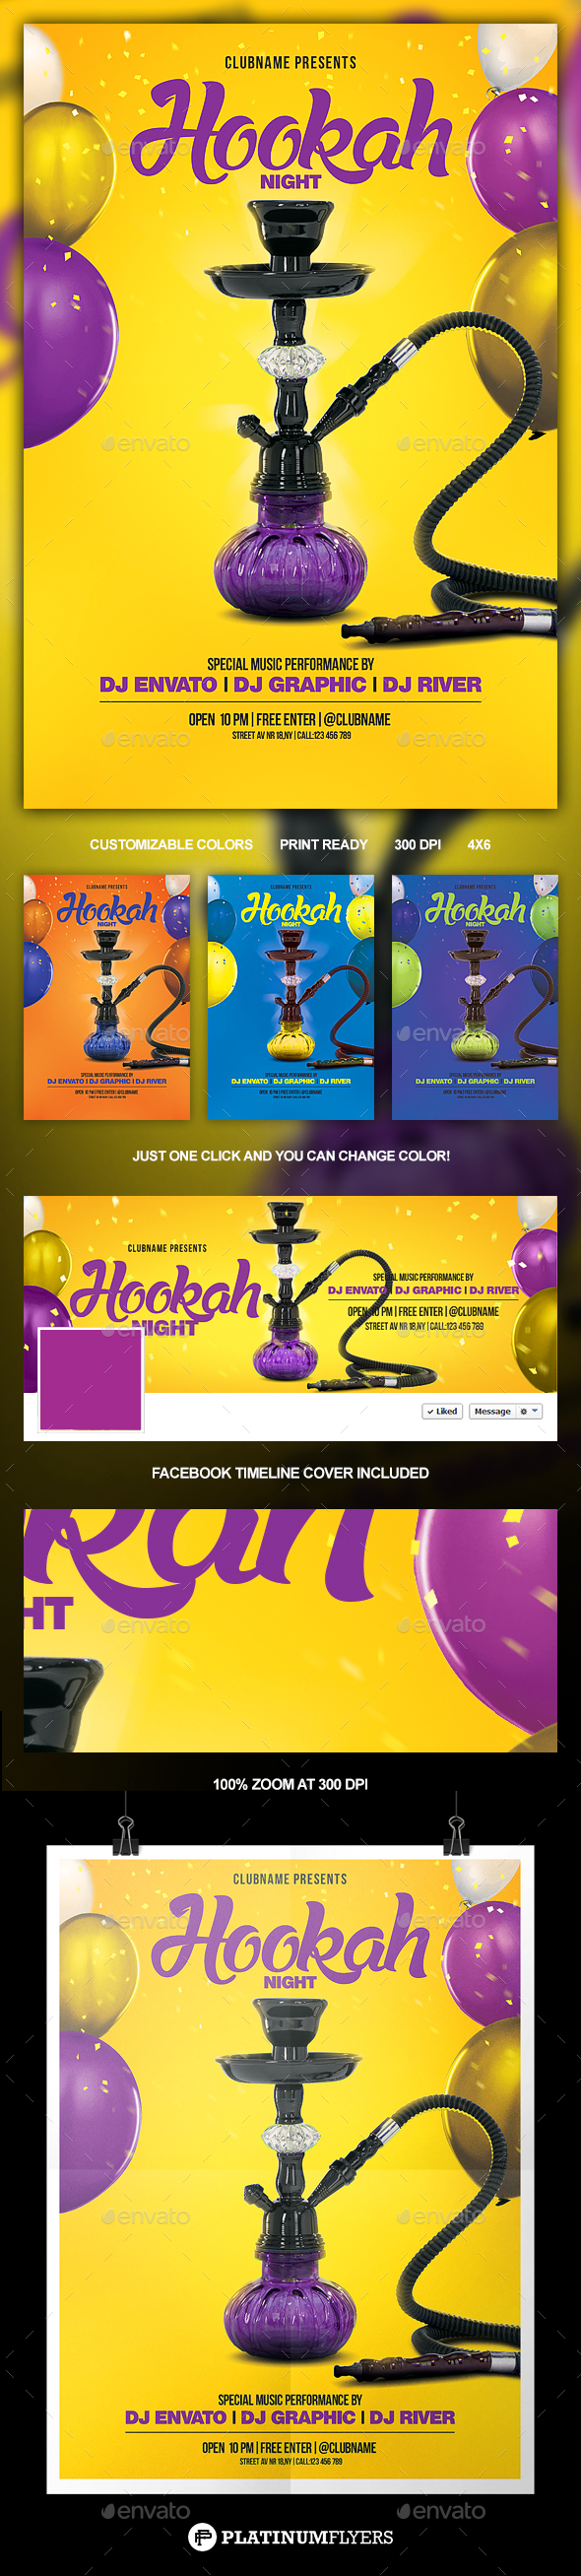 Hookah Night Flyer - Print Templates